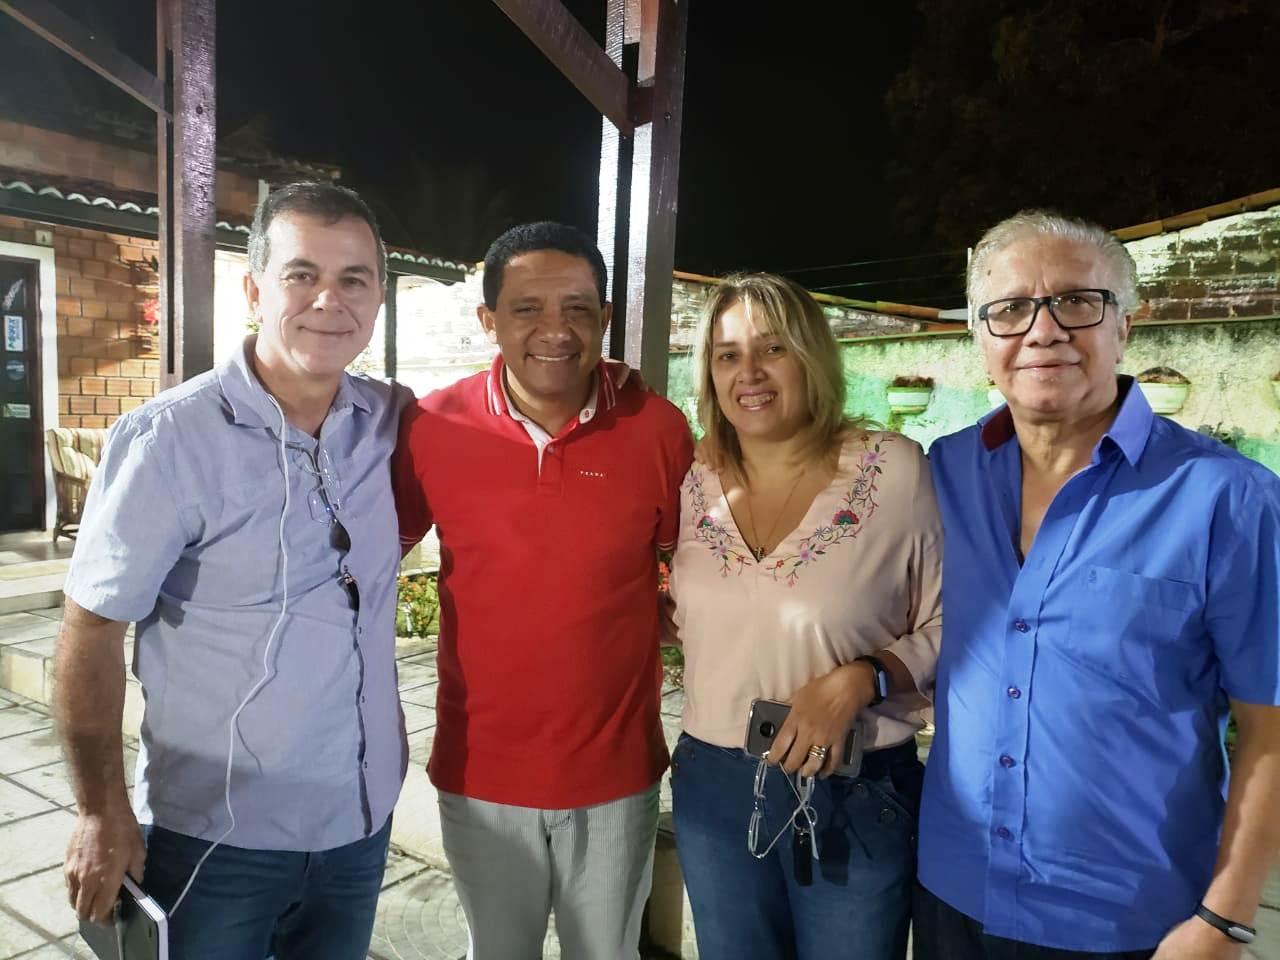 Prefeito Júlio Cézar diz que deputado Ronaldo Medeiros fortaleceu apoio a Palmeira